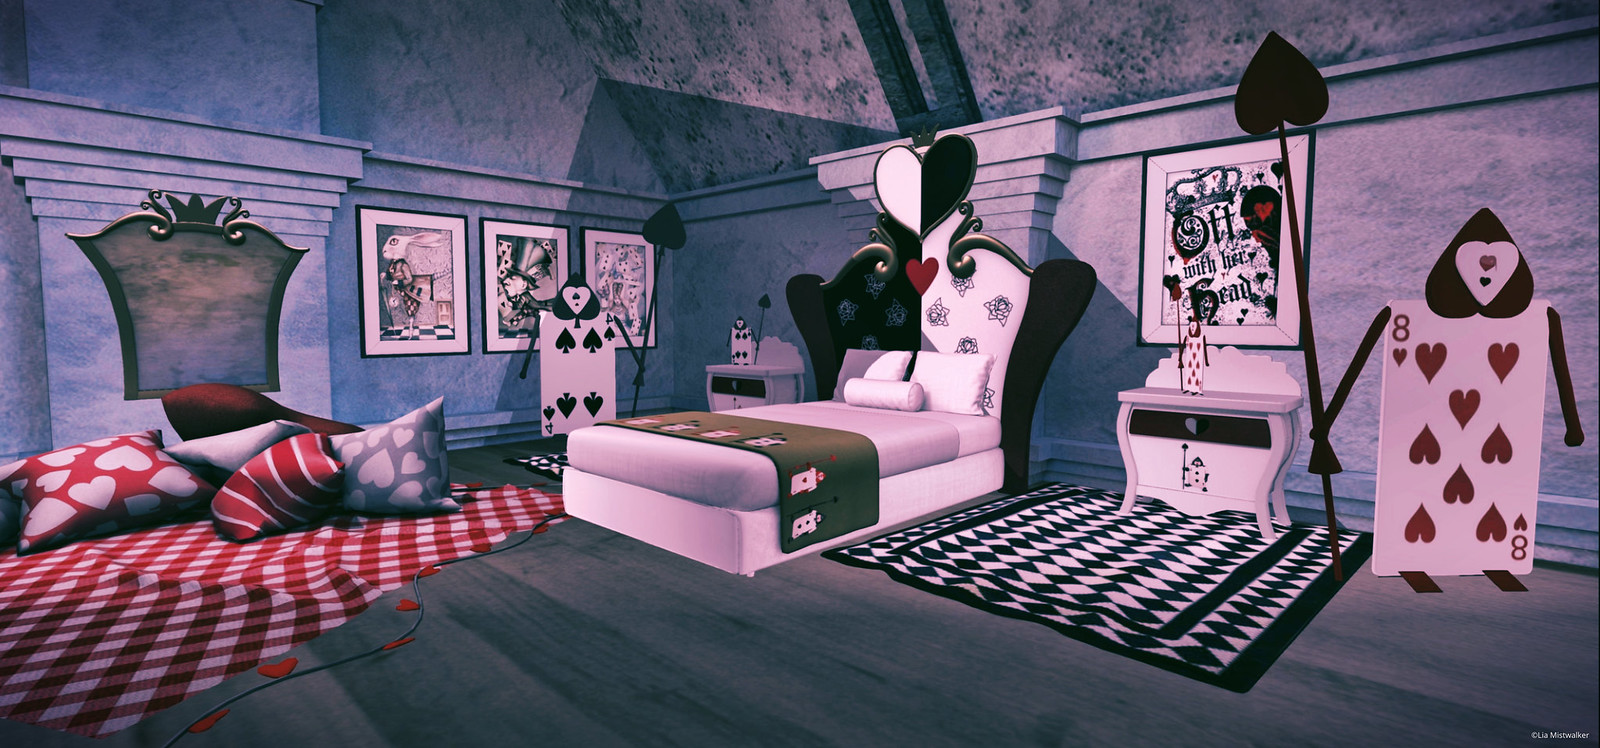 Home Interior Furniture Therapy # 653